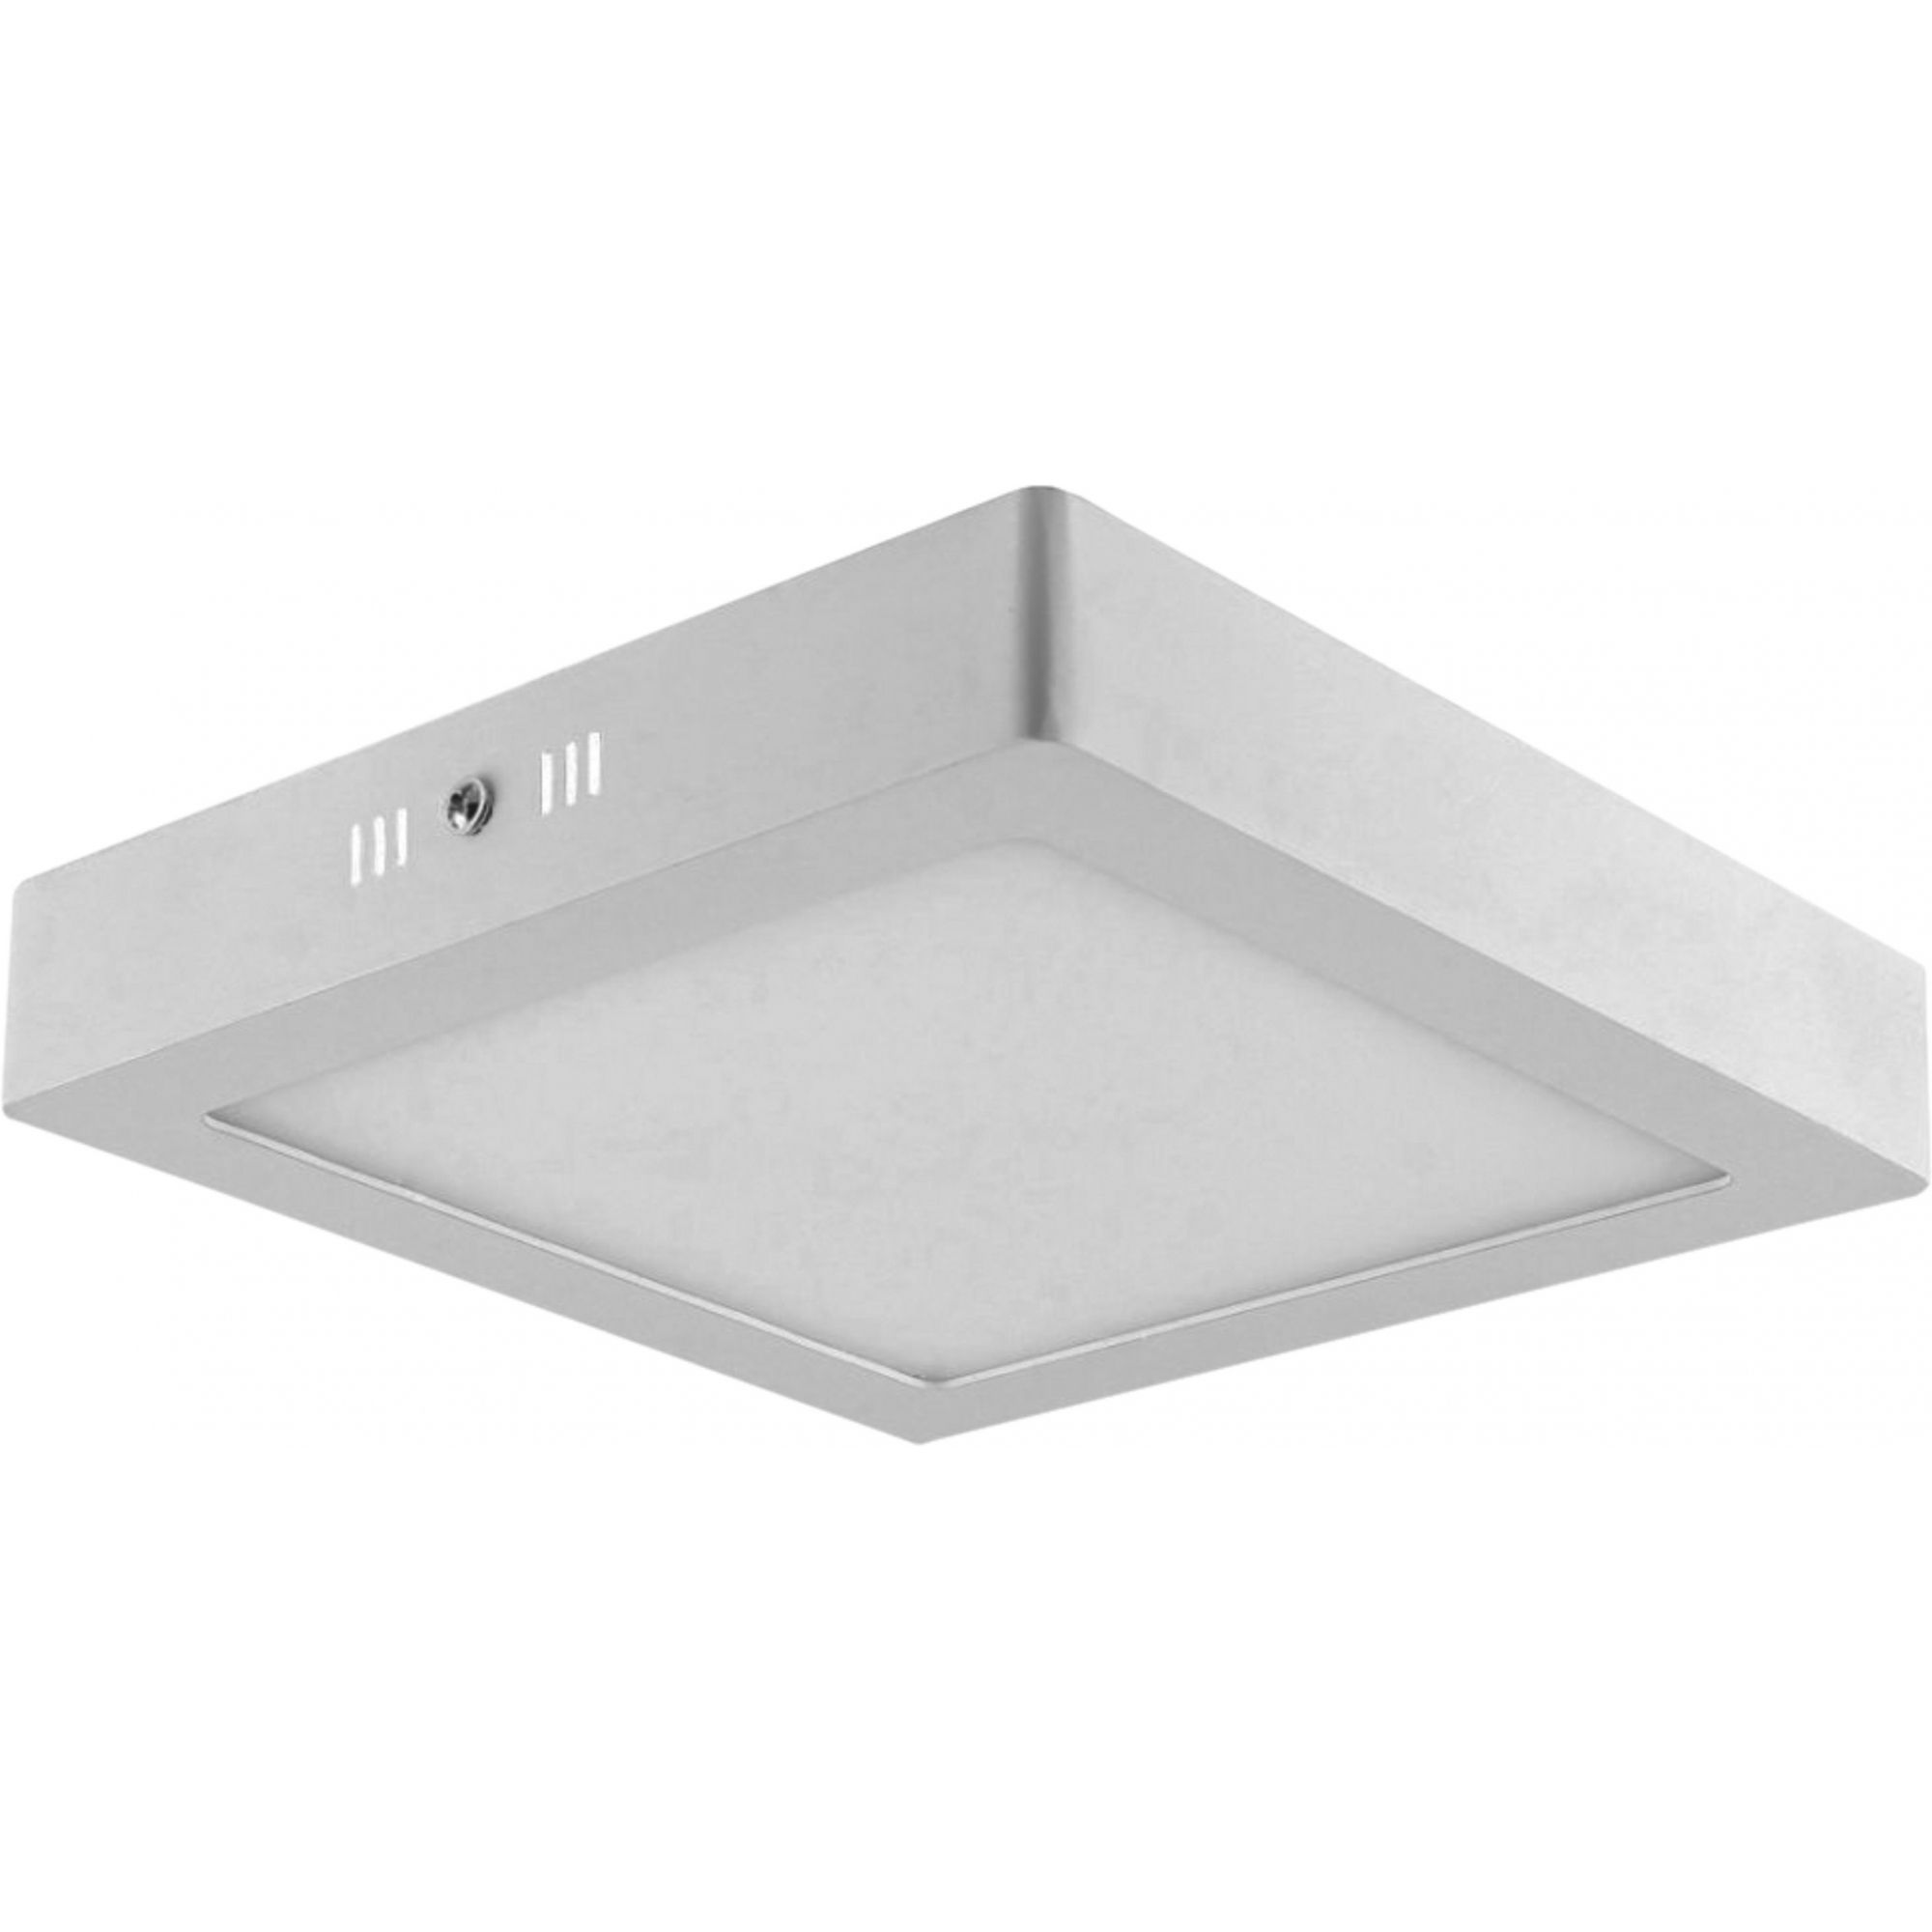 Painel LED Sobrepor Dimerizável 25W 30X30CM Quadrado 110V  - Branco Neutro 4000K